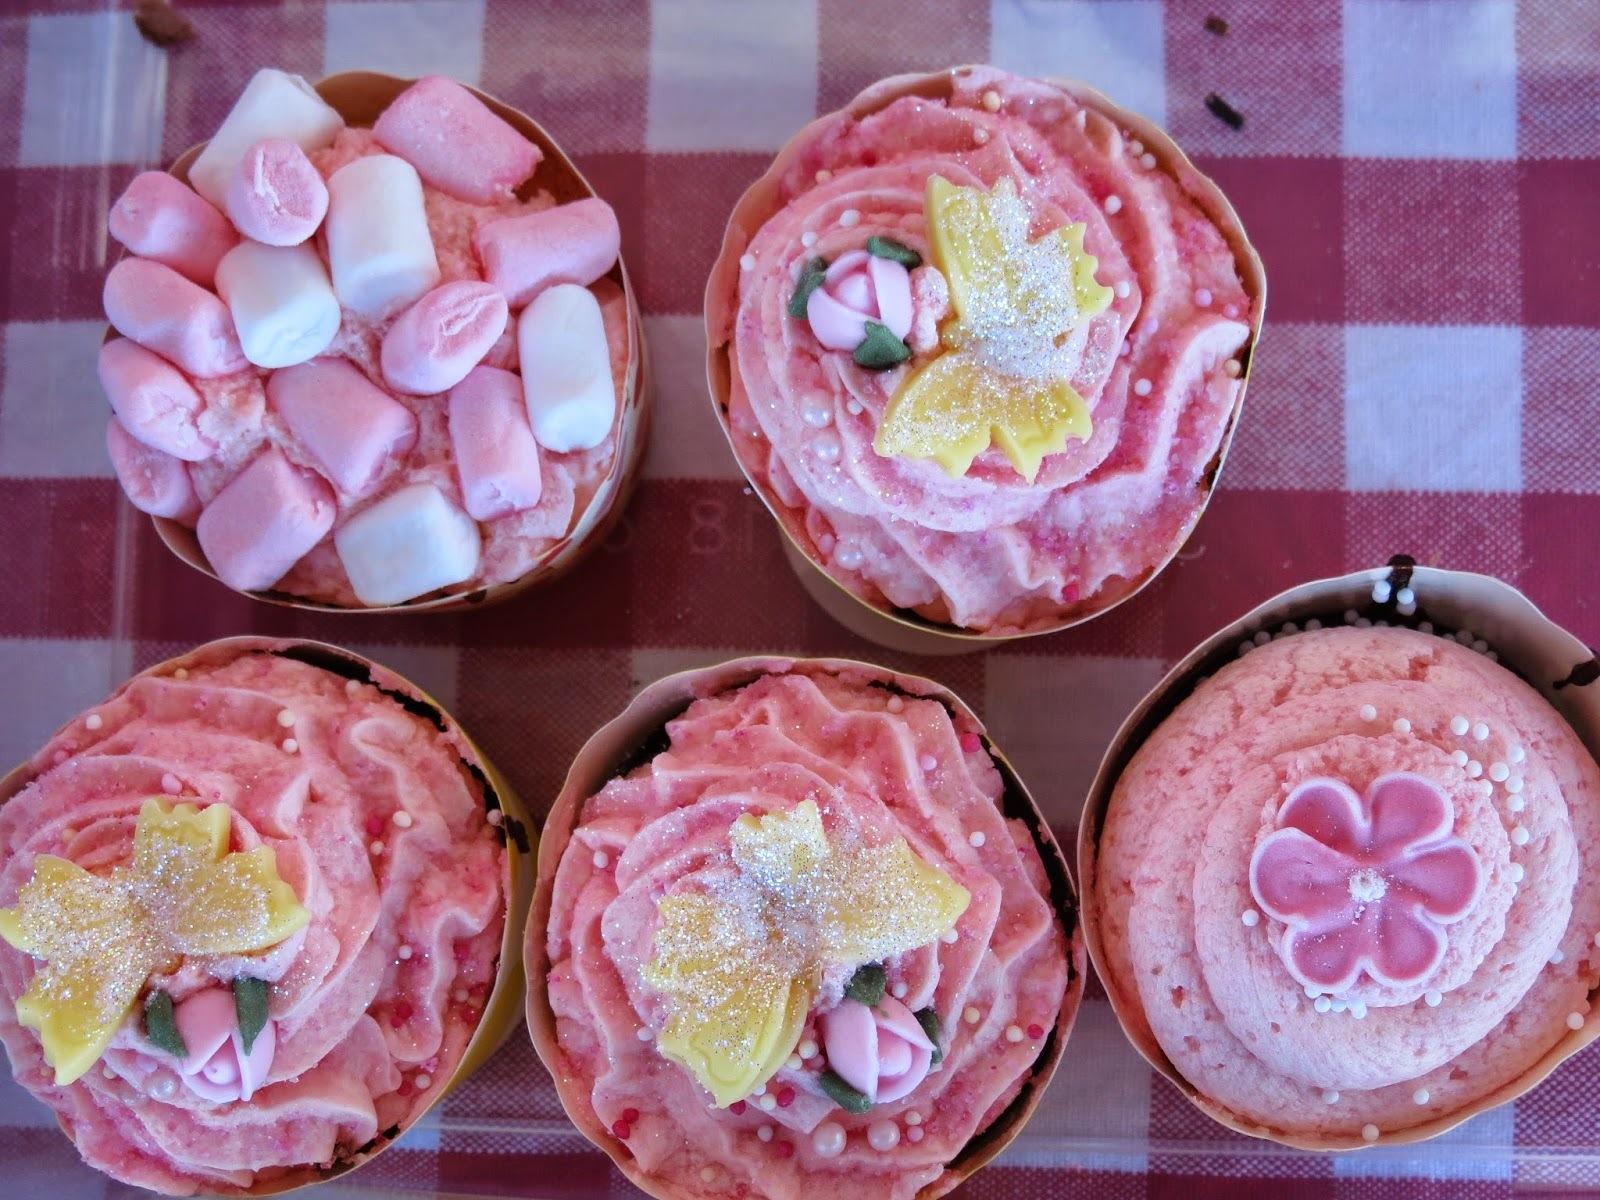 Brandy balls and cake stalls